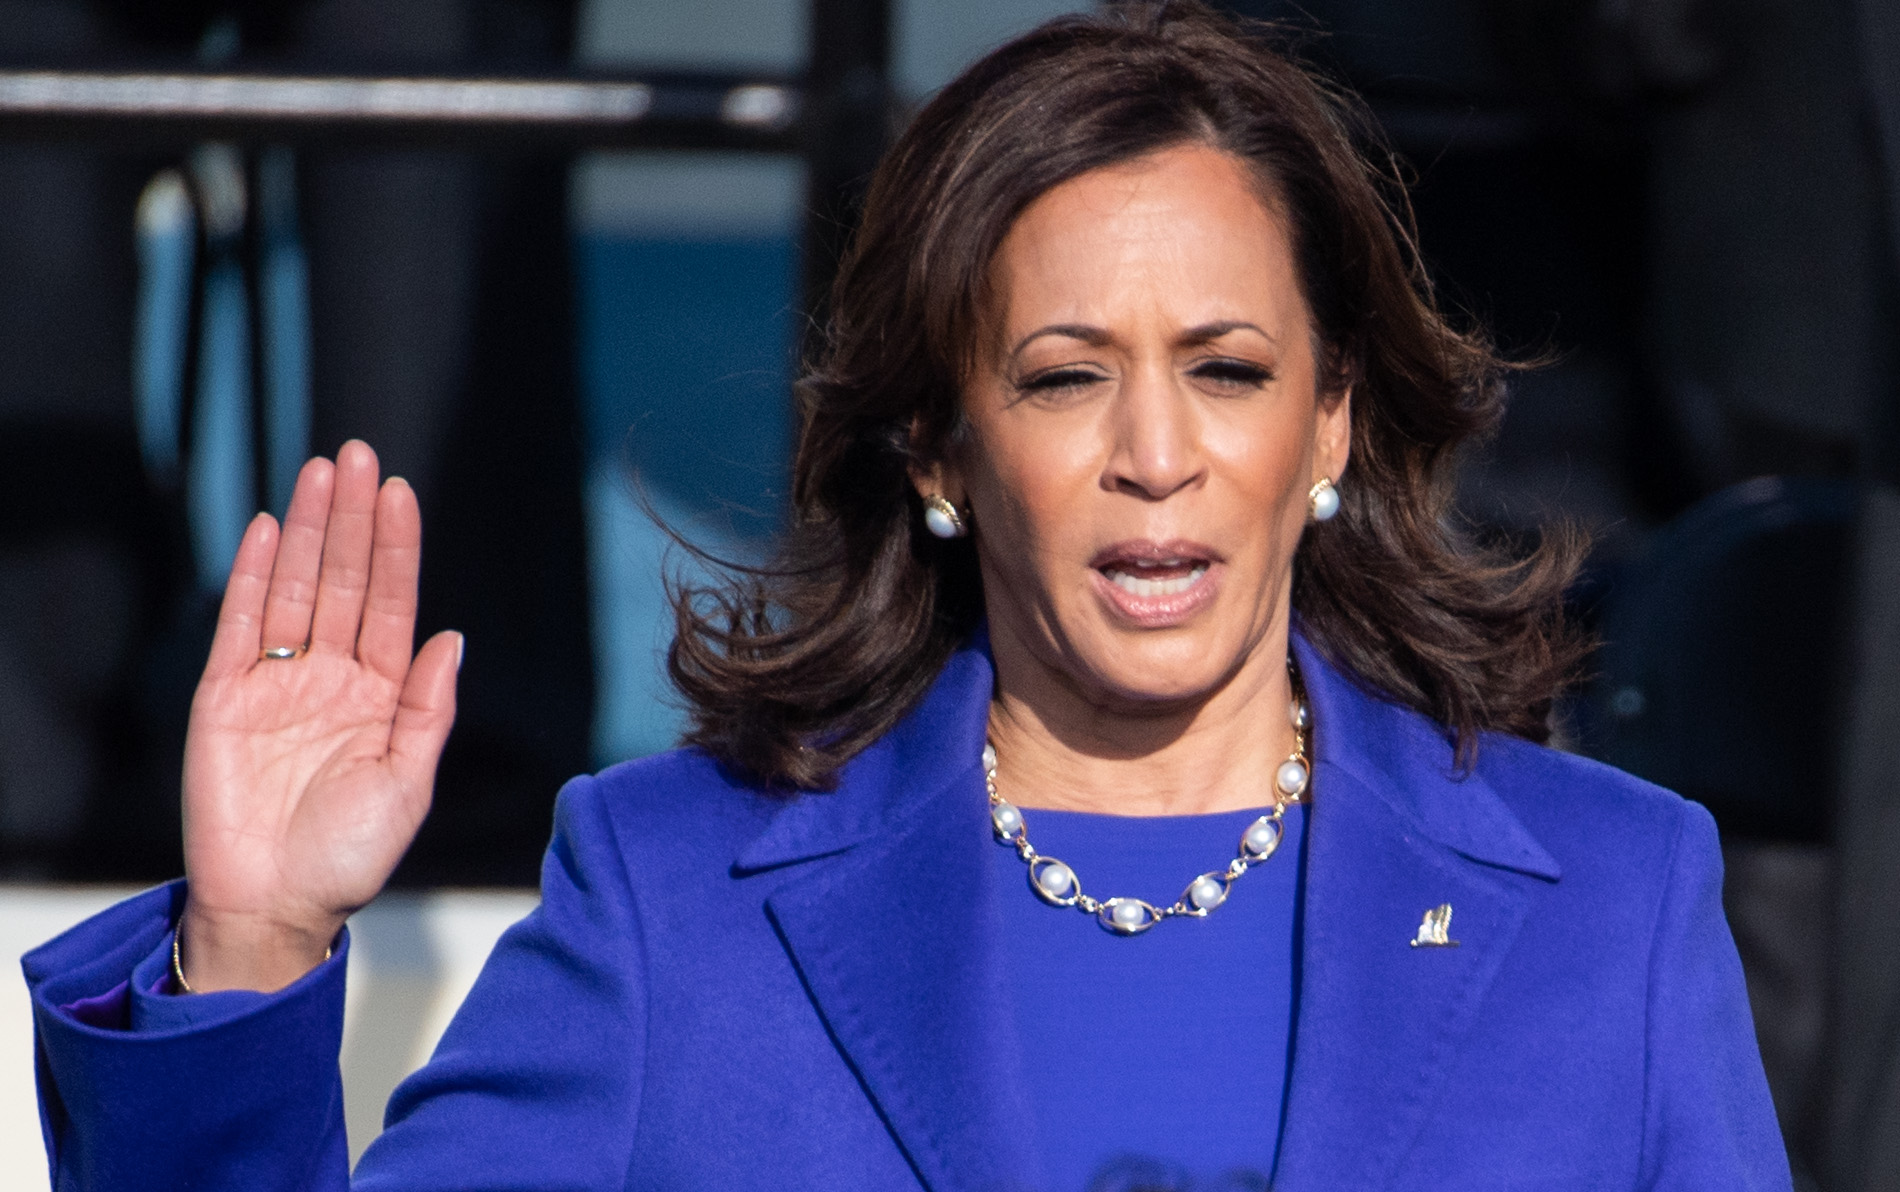 Oprah Winfrey leads celebrity reactions as Biden-Harris take office: An 'extraordinary moment for women'